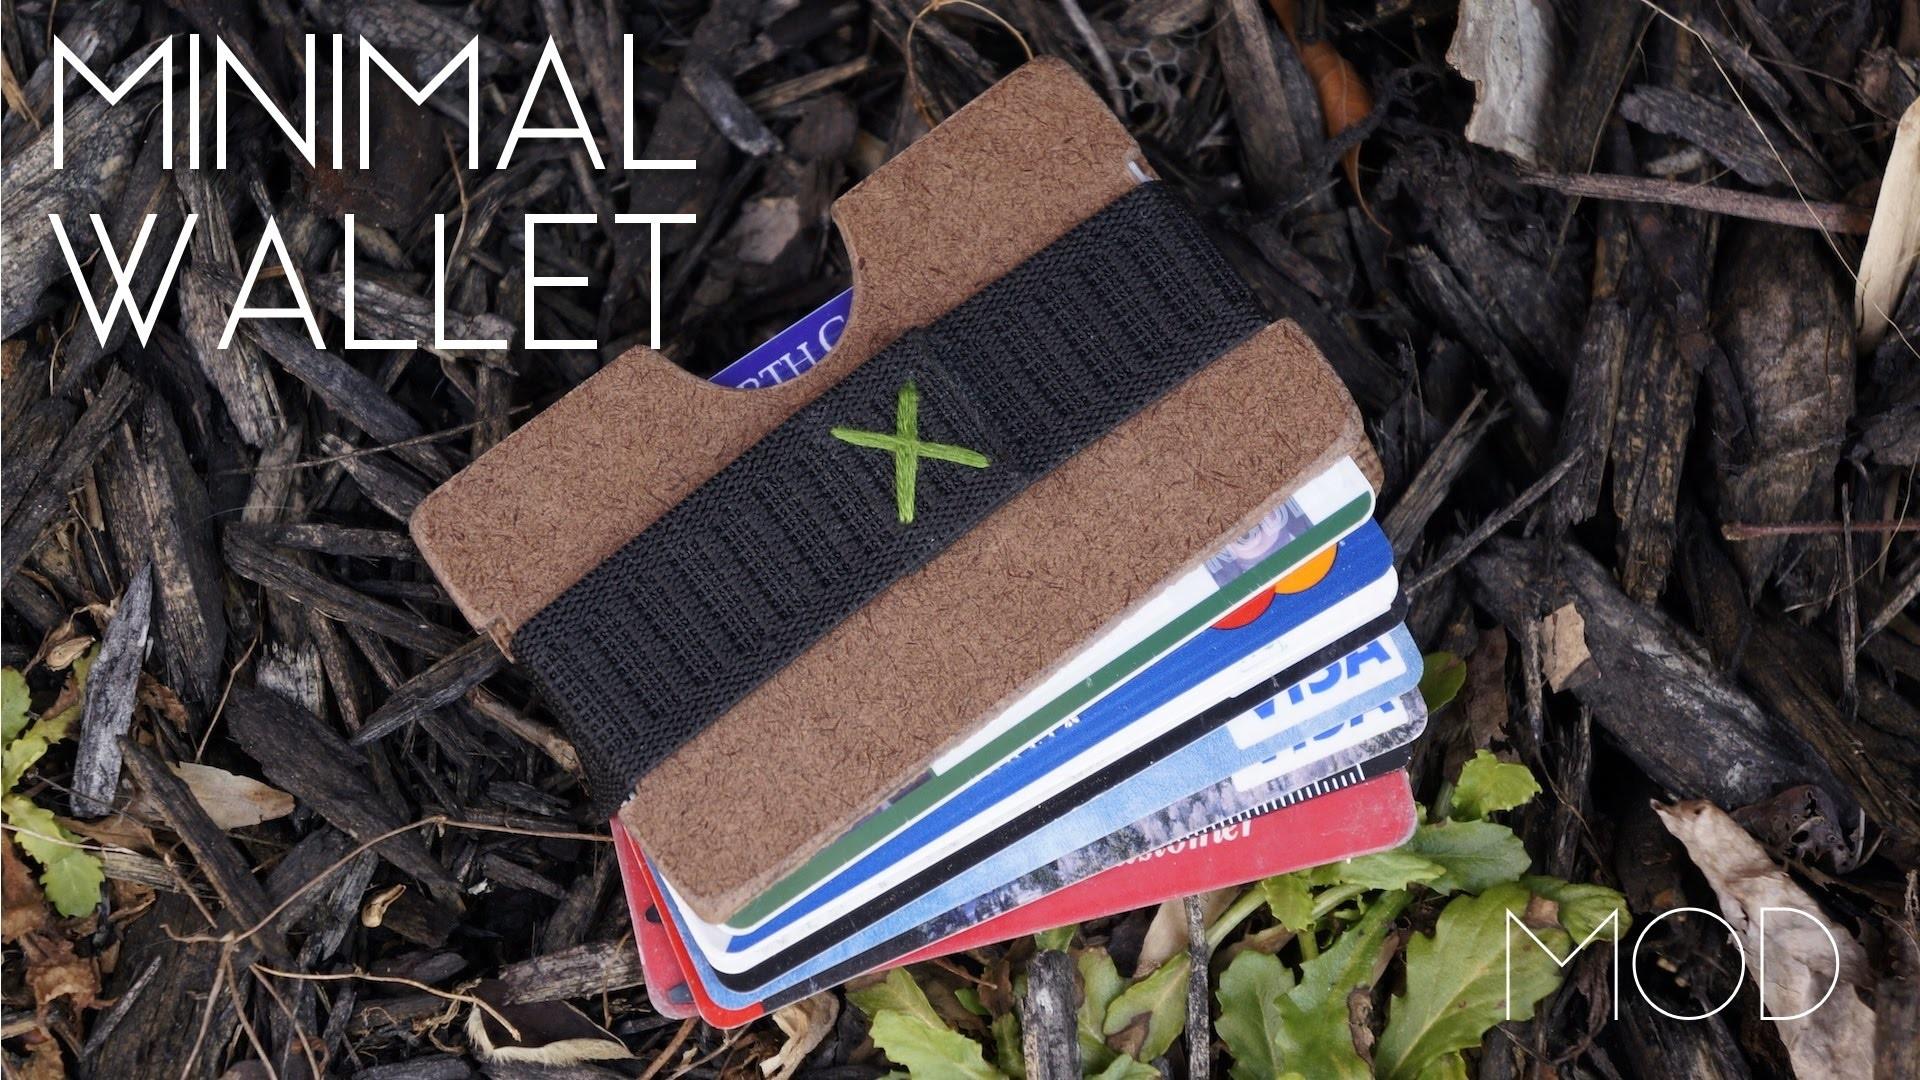 Mini MOD Monday: DIY Minimalist Wallet